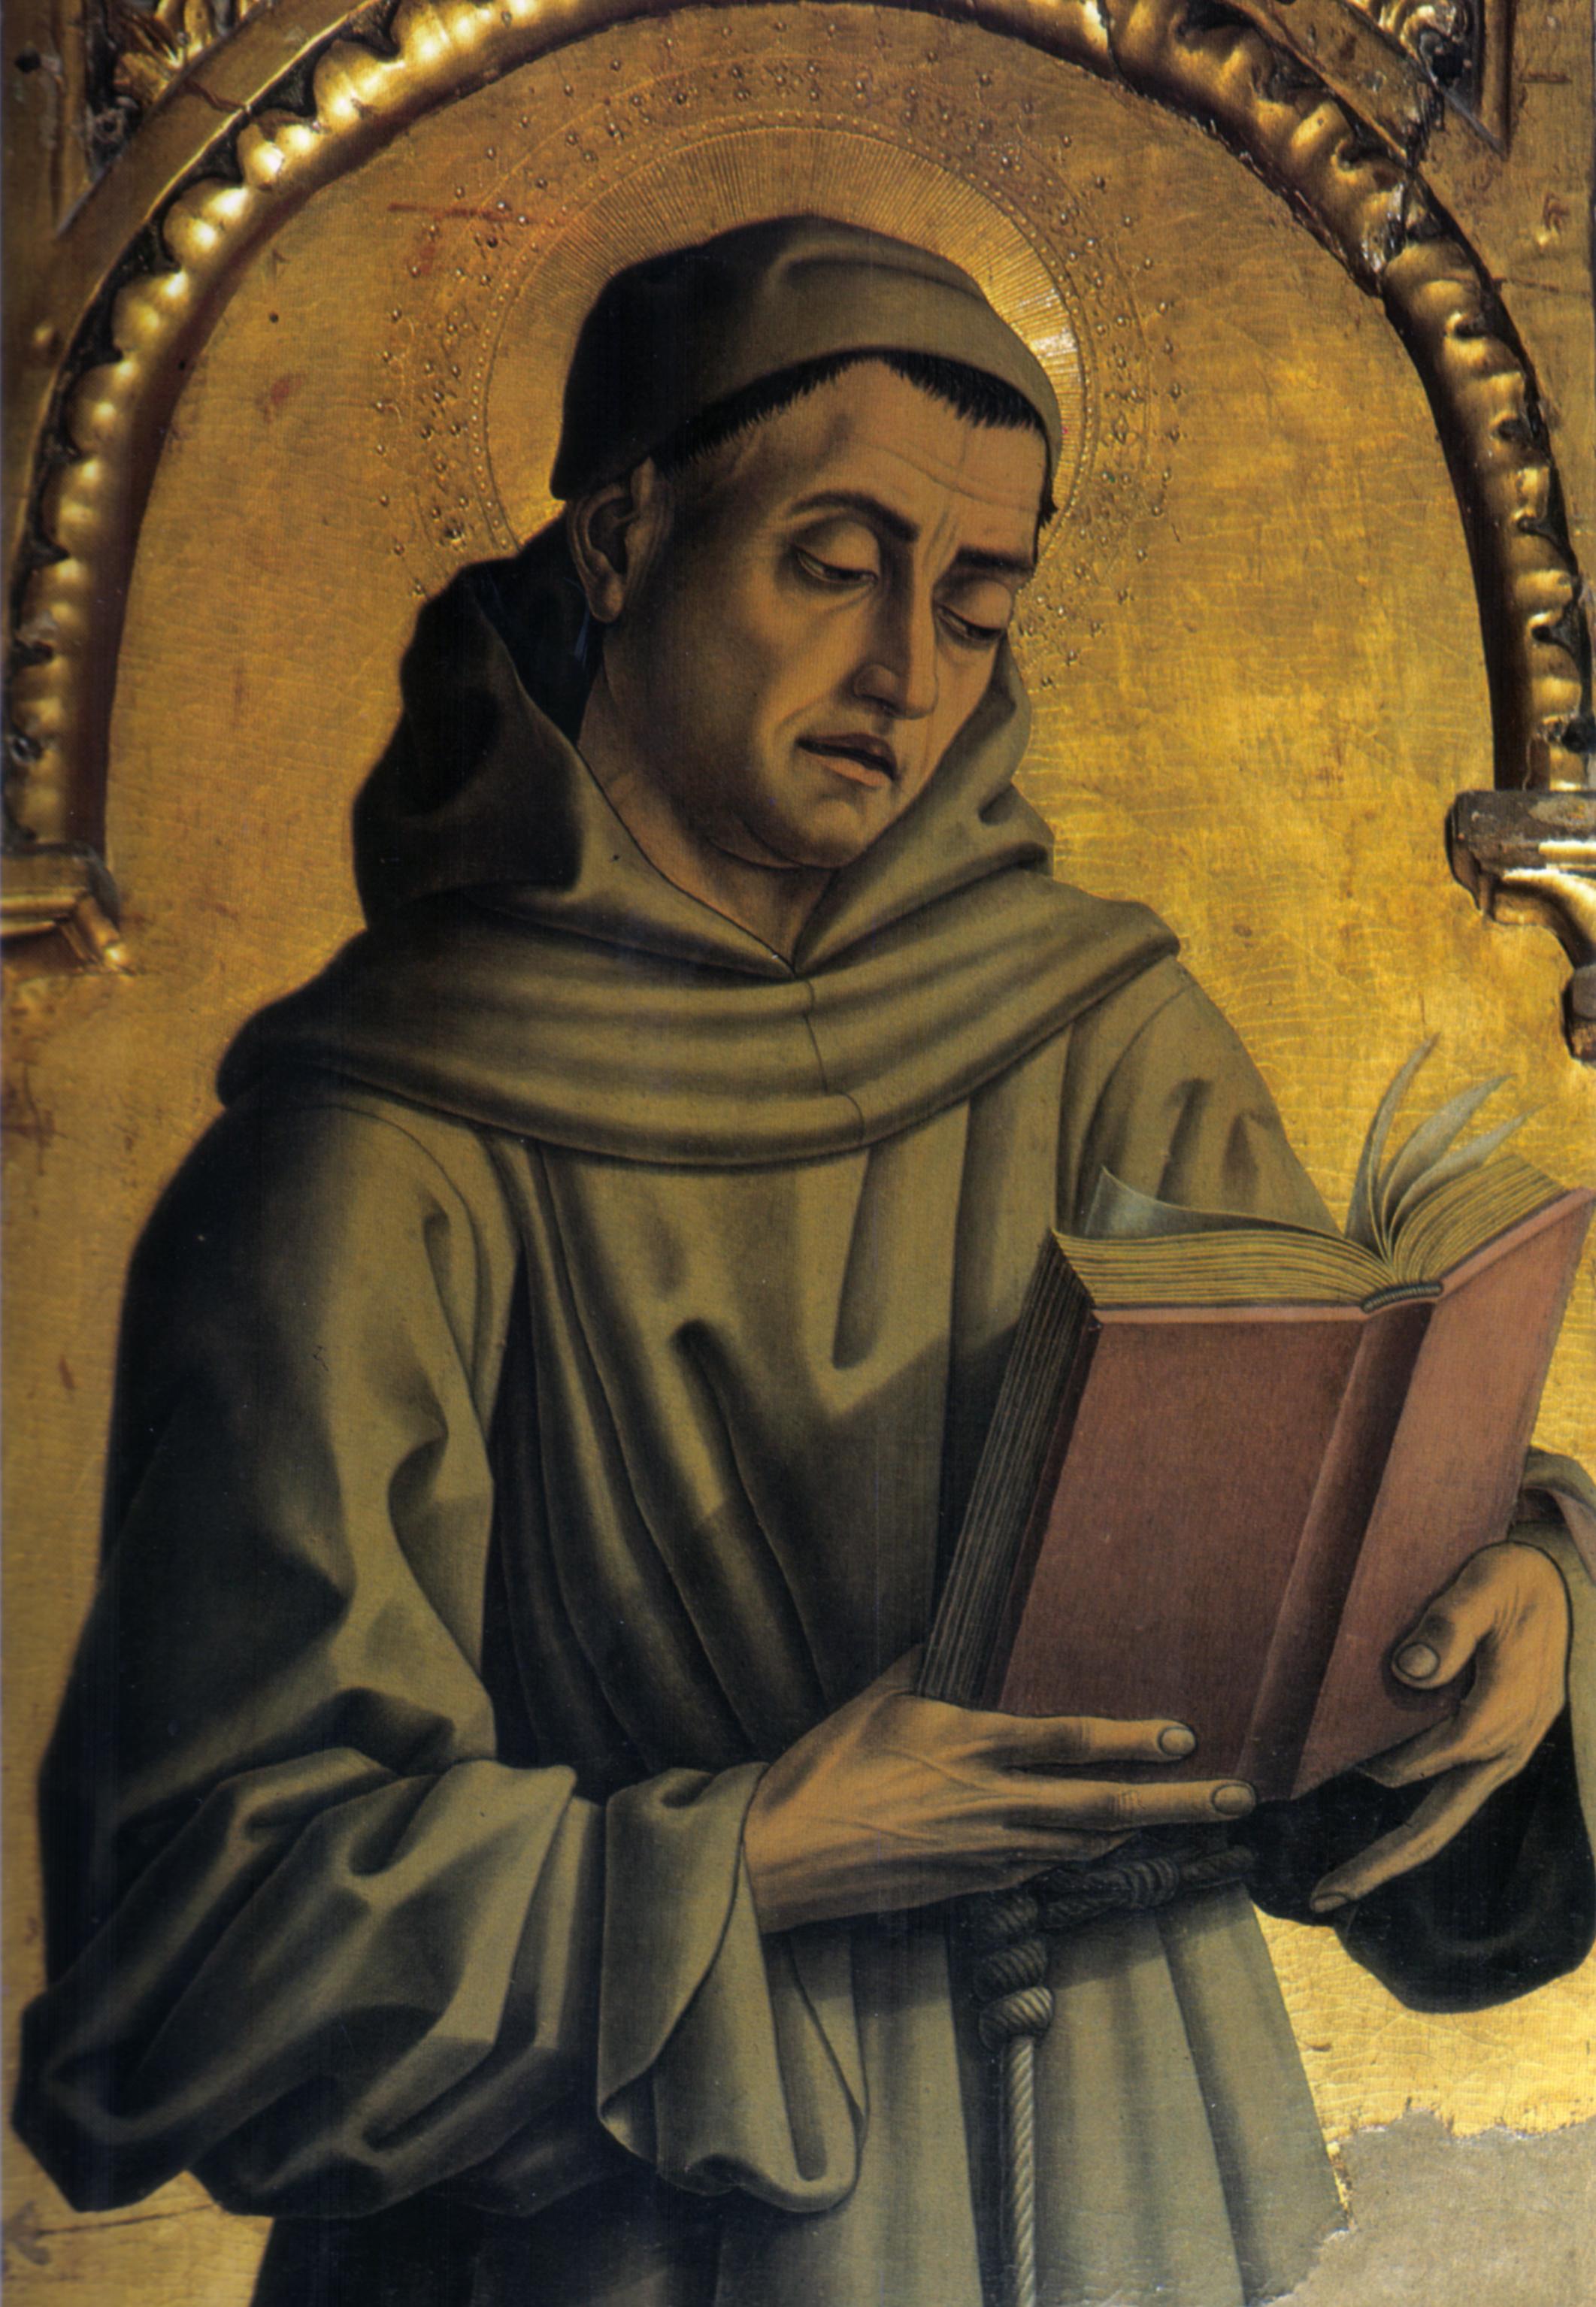 https://upload.wikimedia.org/wikipedia/commons/6/64/Carlo_crivelli%2C_montefiore%2C_santo_francescano.jpg